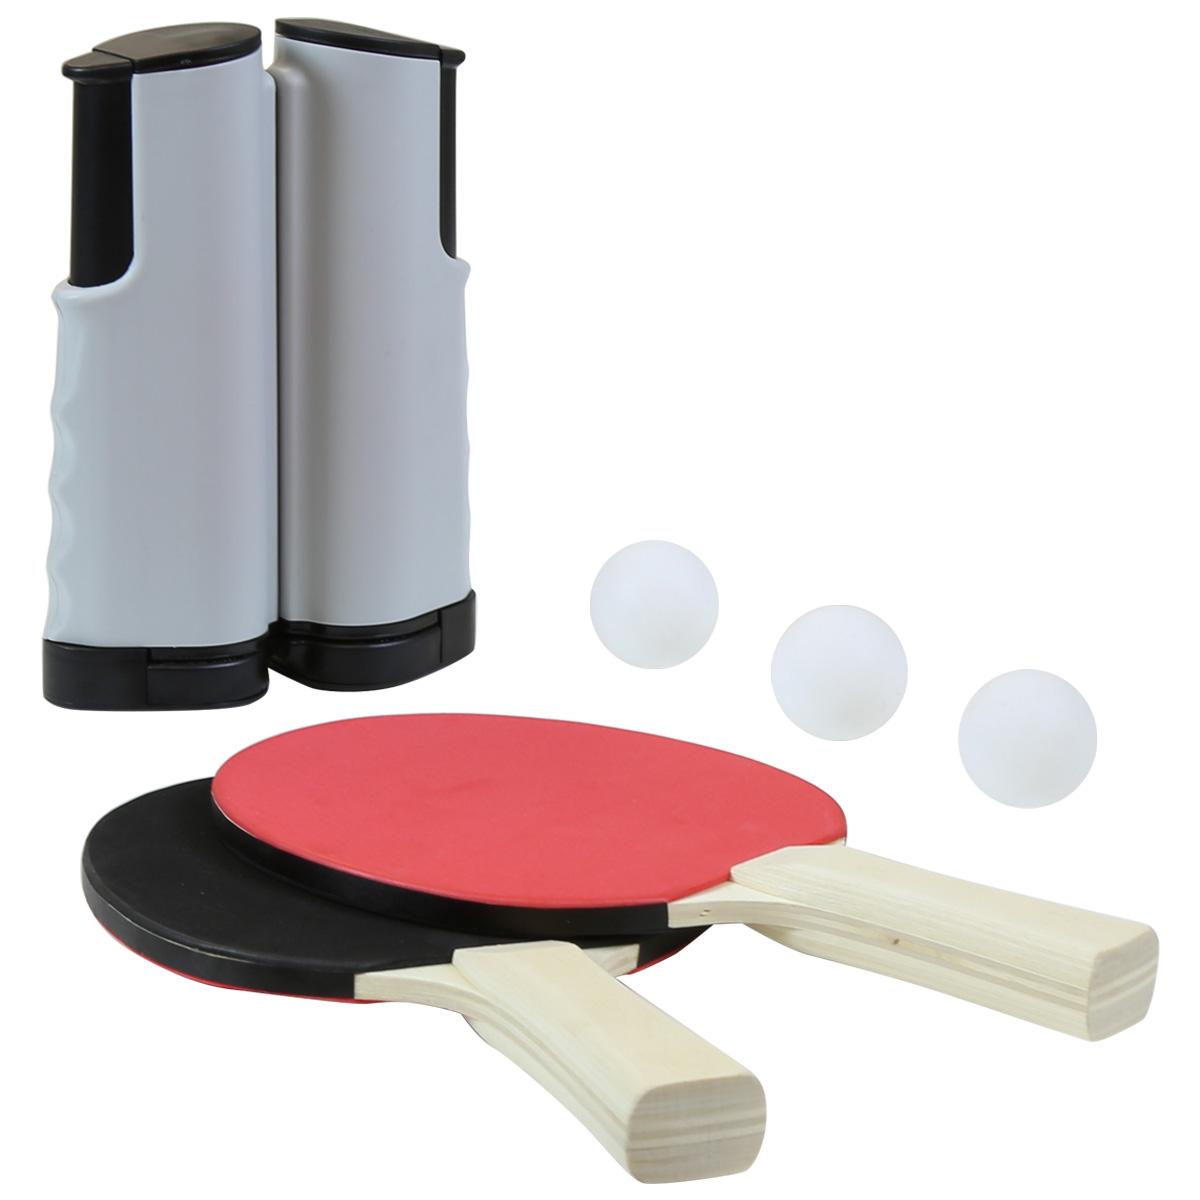 Charles bentley instant table tennis set 2 bats 3 balls 1 for 1 gross table tennis balls